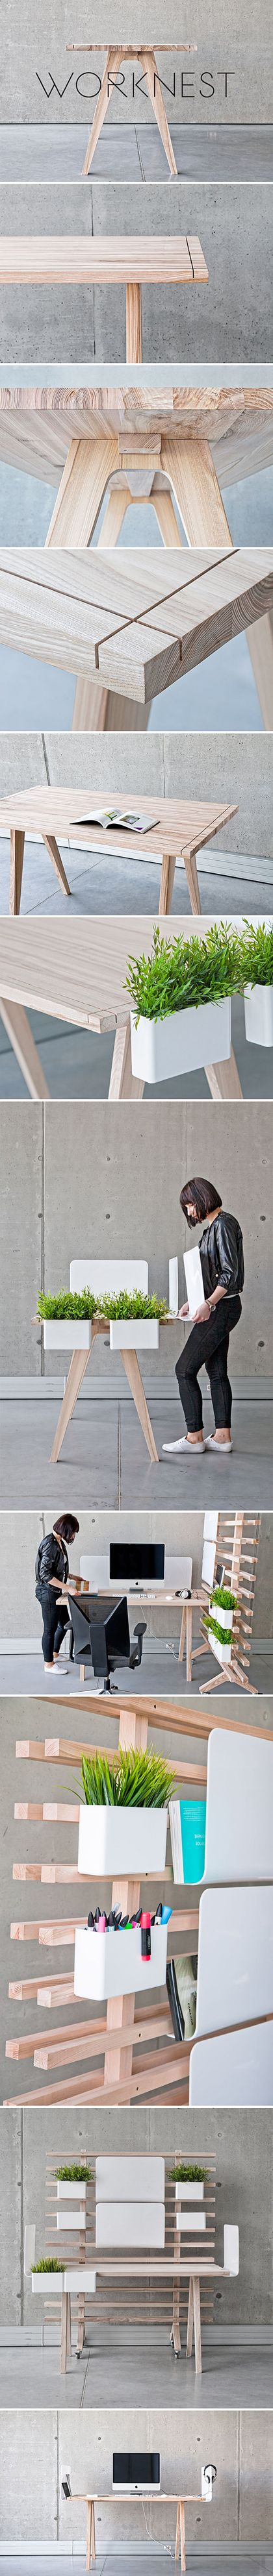 Worknest: handcrafted modular workplace, design from Wiktoria Lenart. | Handgemaakt modulaire werkplek.